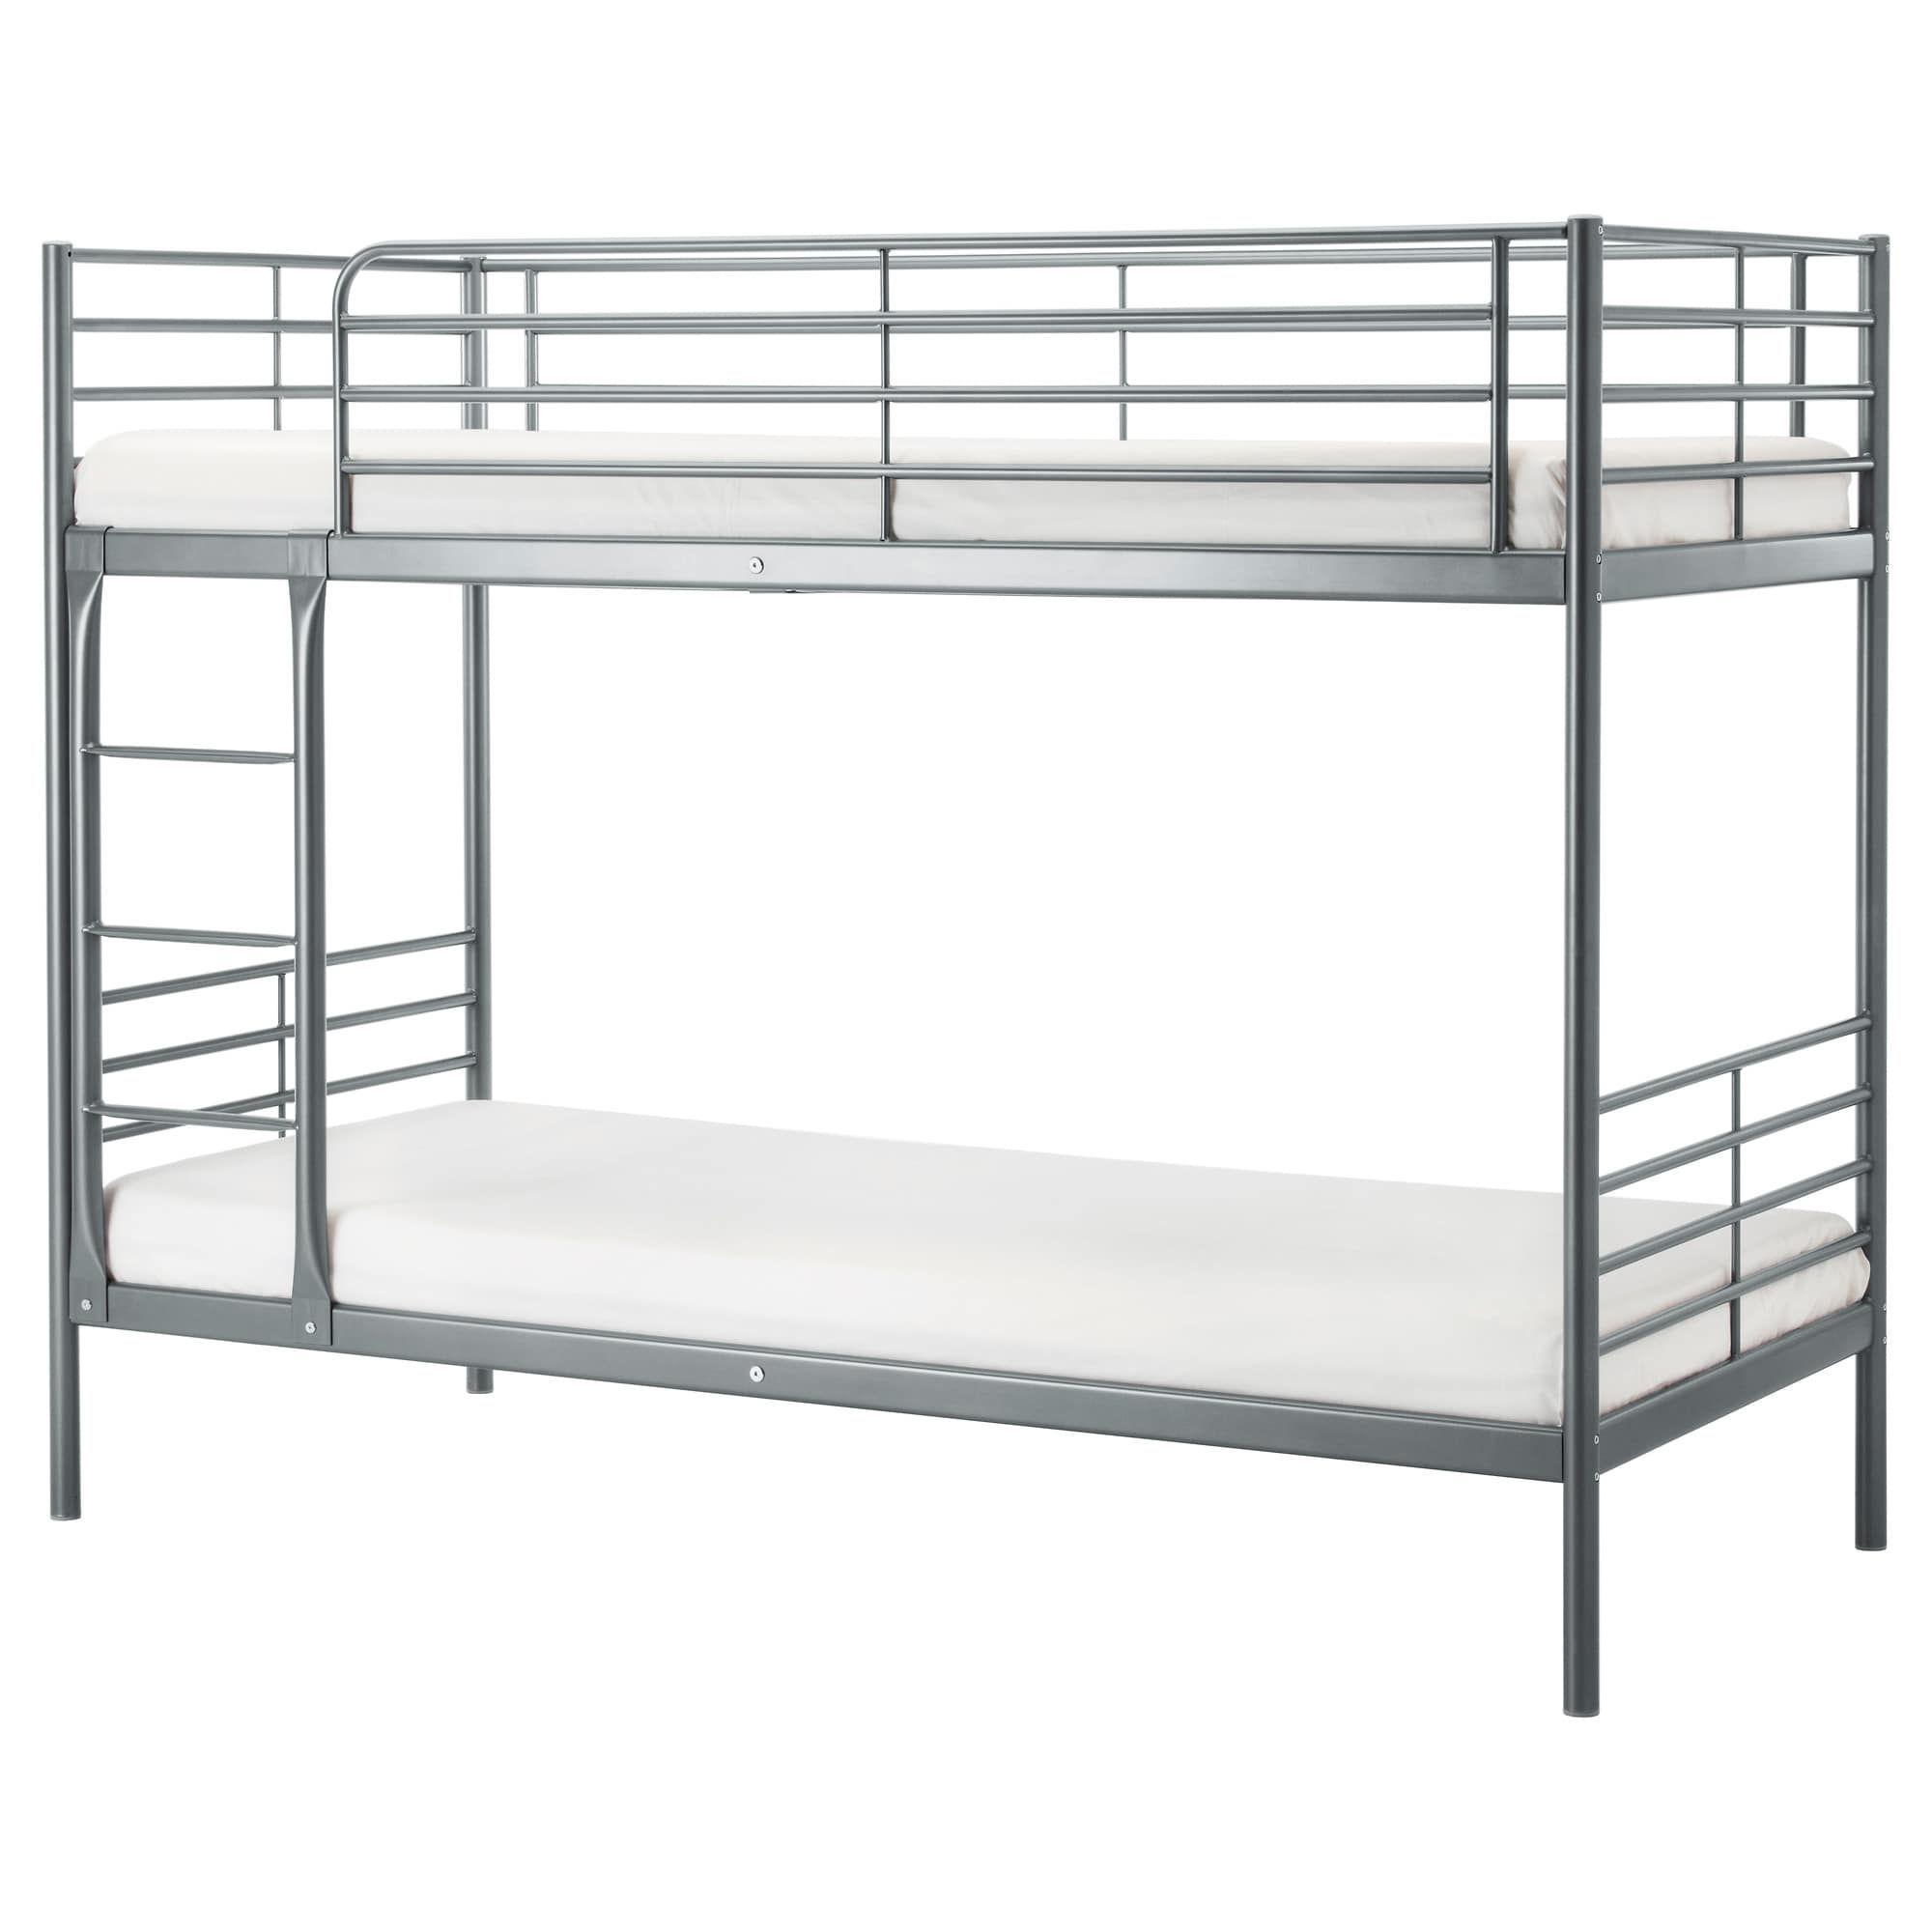 Us Furniture And Home Furnishings Metal Bunk Beds Ikea Metal